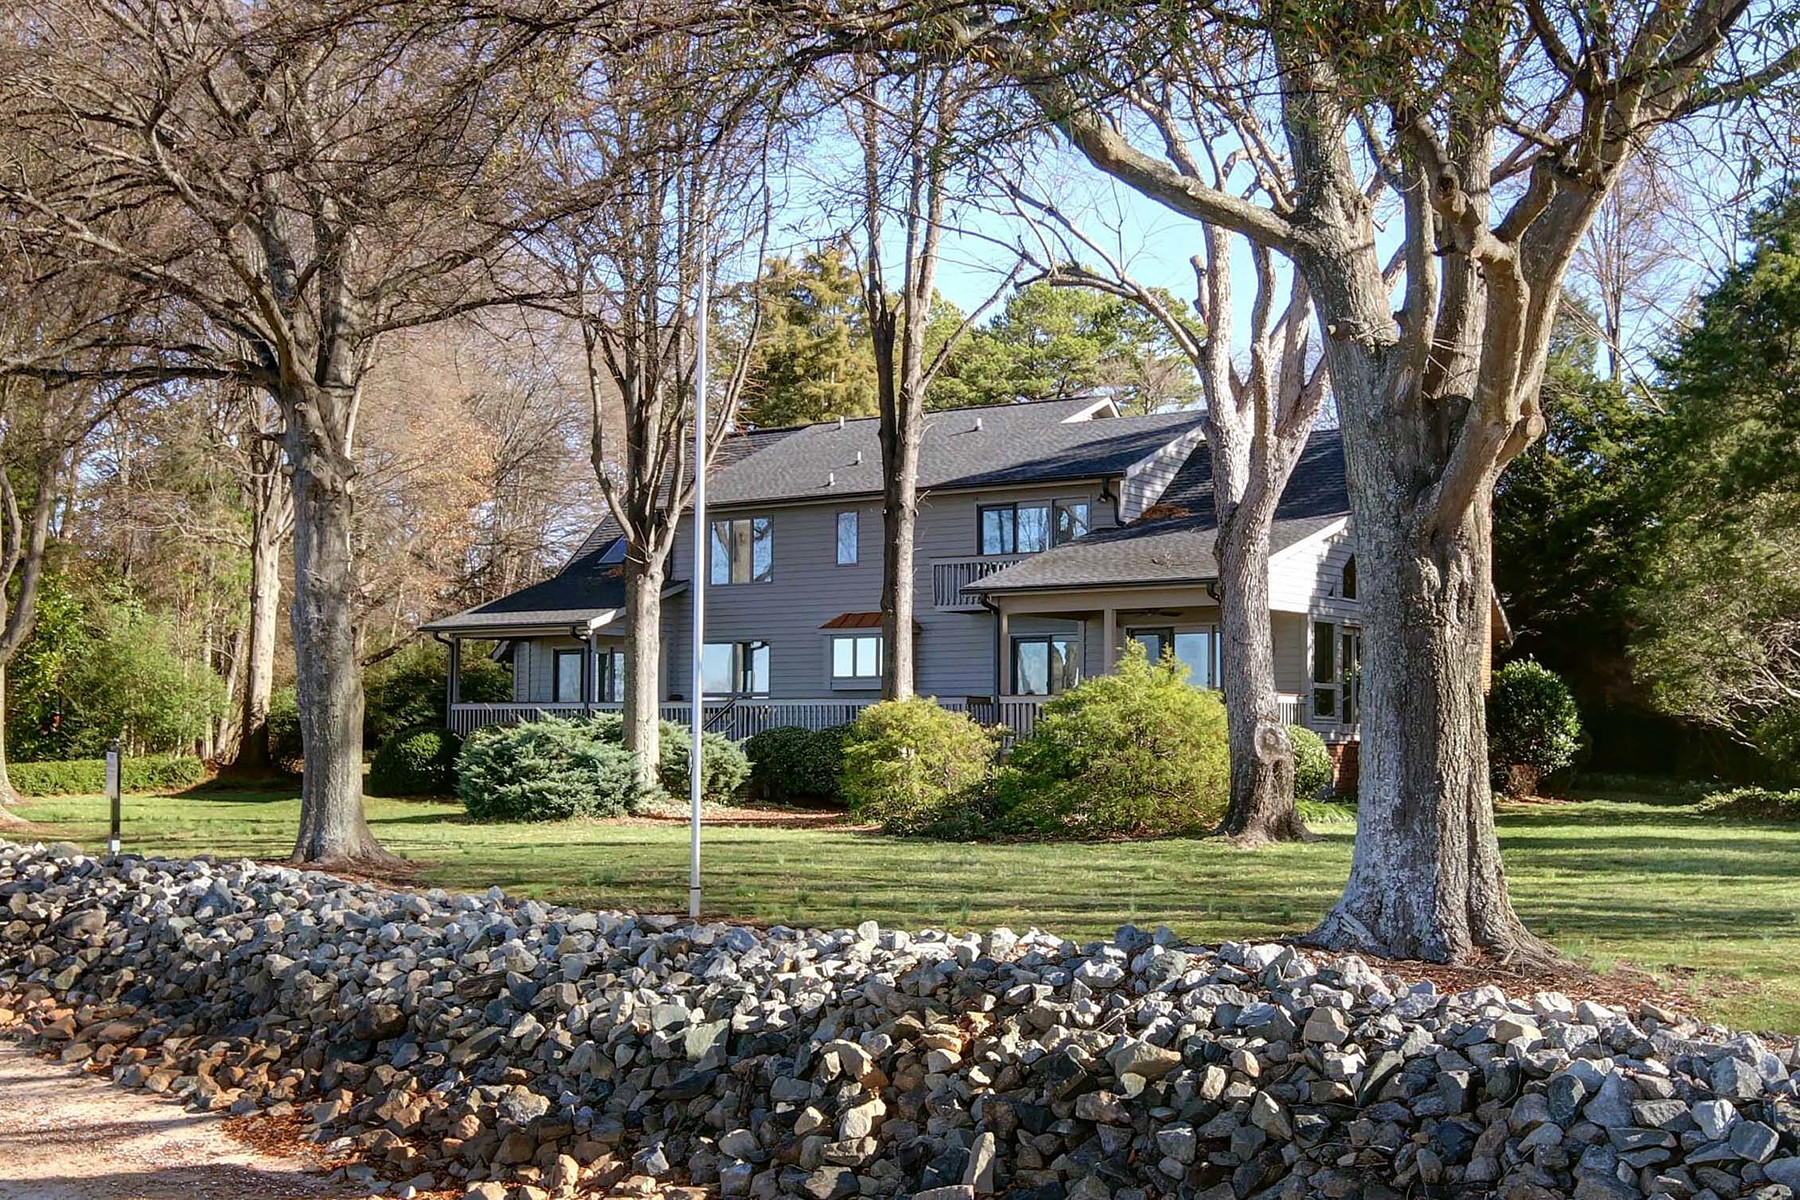 Single Family Home for Sale at 20200 Lola Cir , Cornelius, NC 28031 20200 Lola Cir, Cornelius, North Carolina 28031 United States